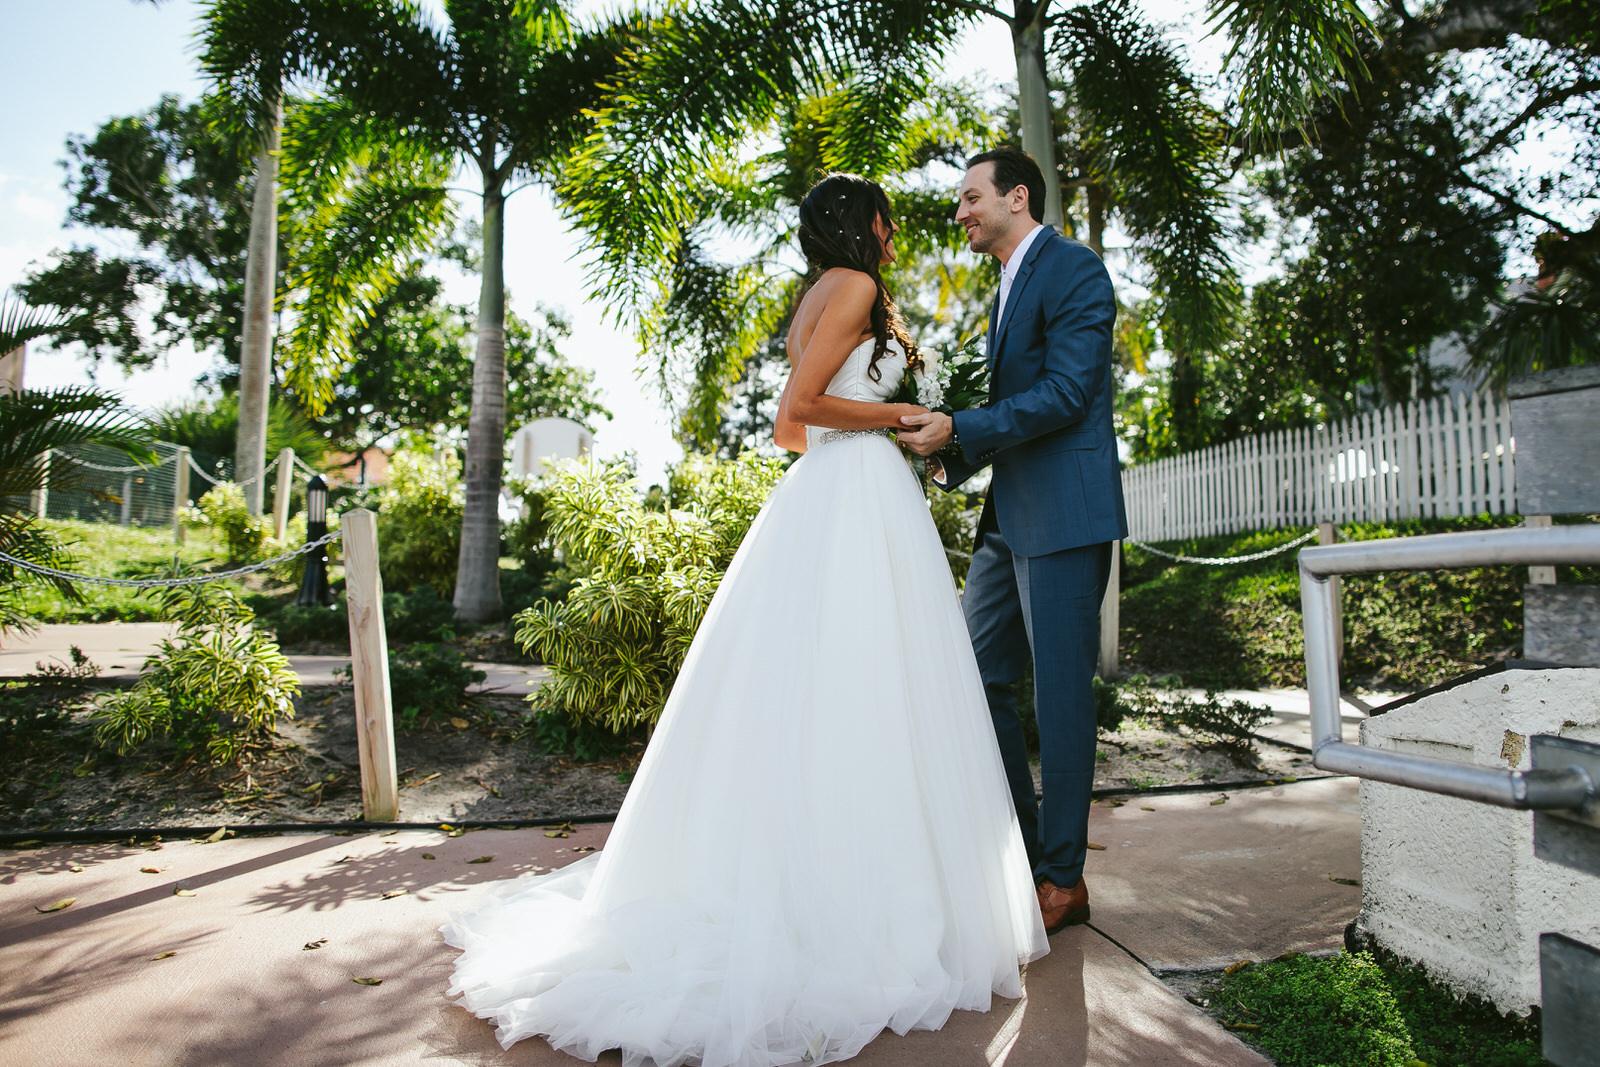 bride_and_groom_jensen_beach_wedding_day-22.jpg